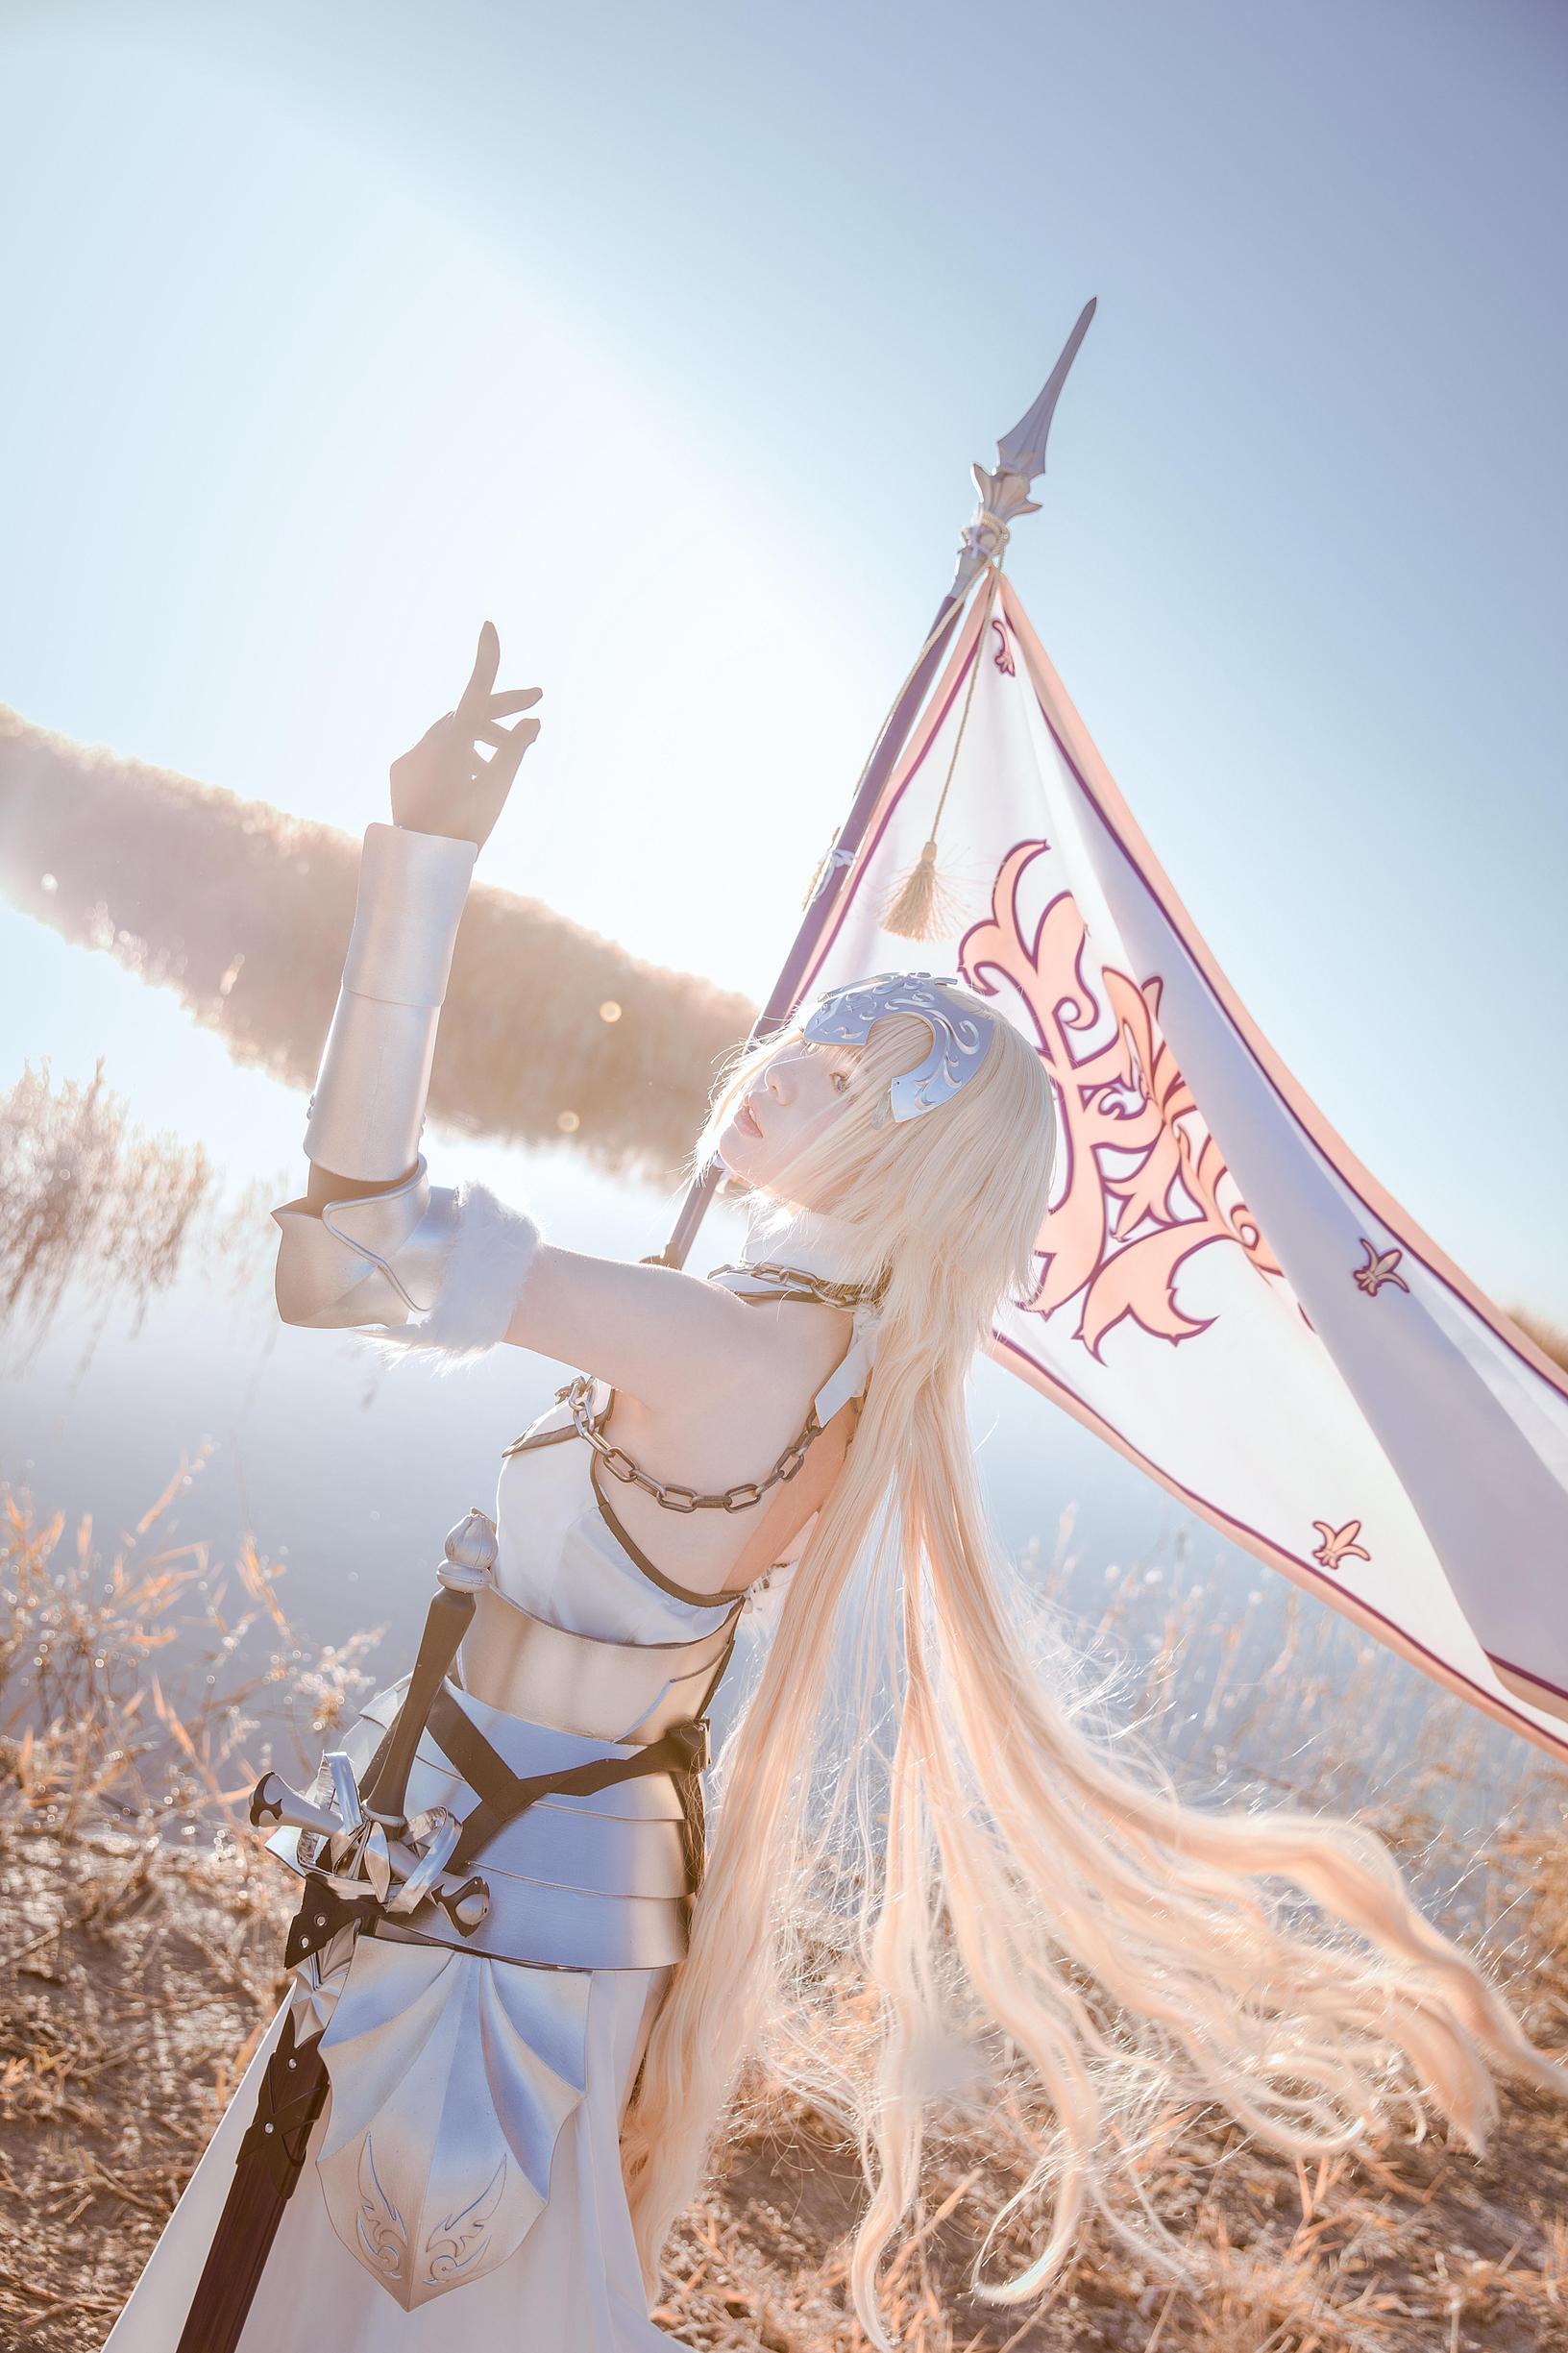 《FATE/GRAND ORDER》贞德cosplay【CN:茶茶子cya】-第1张